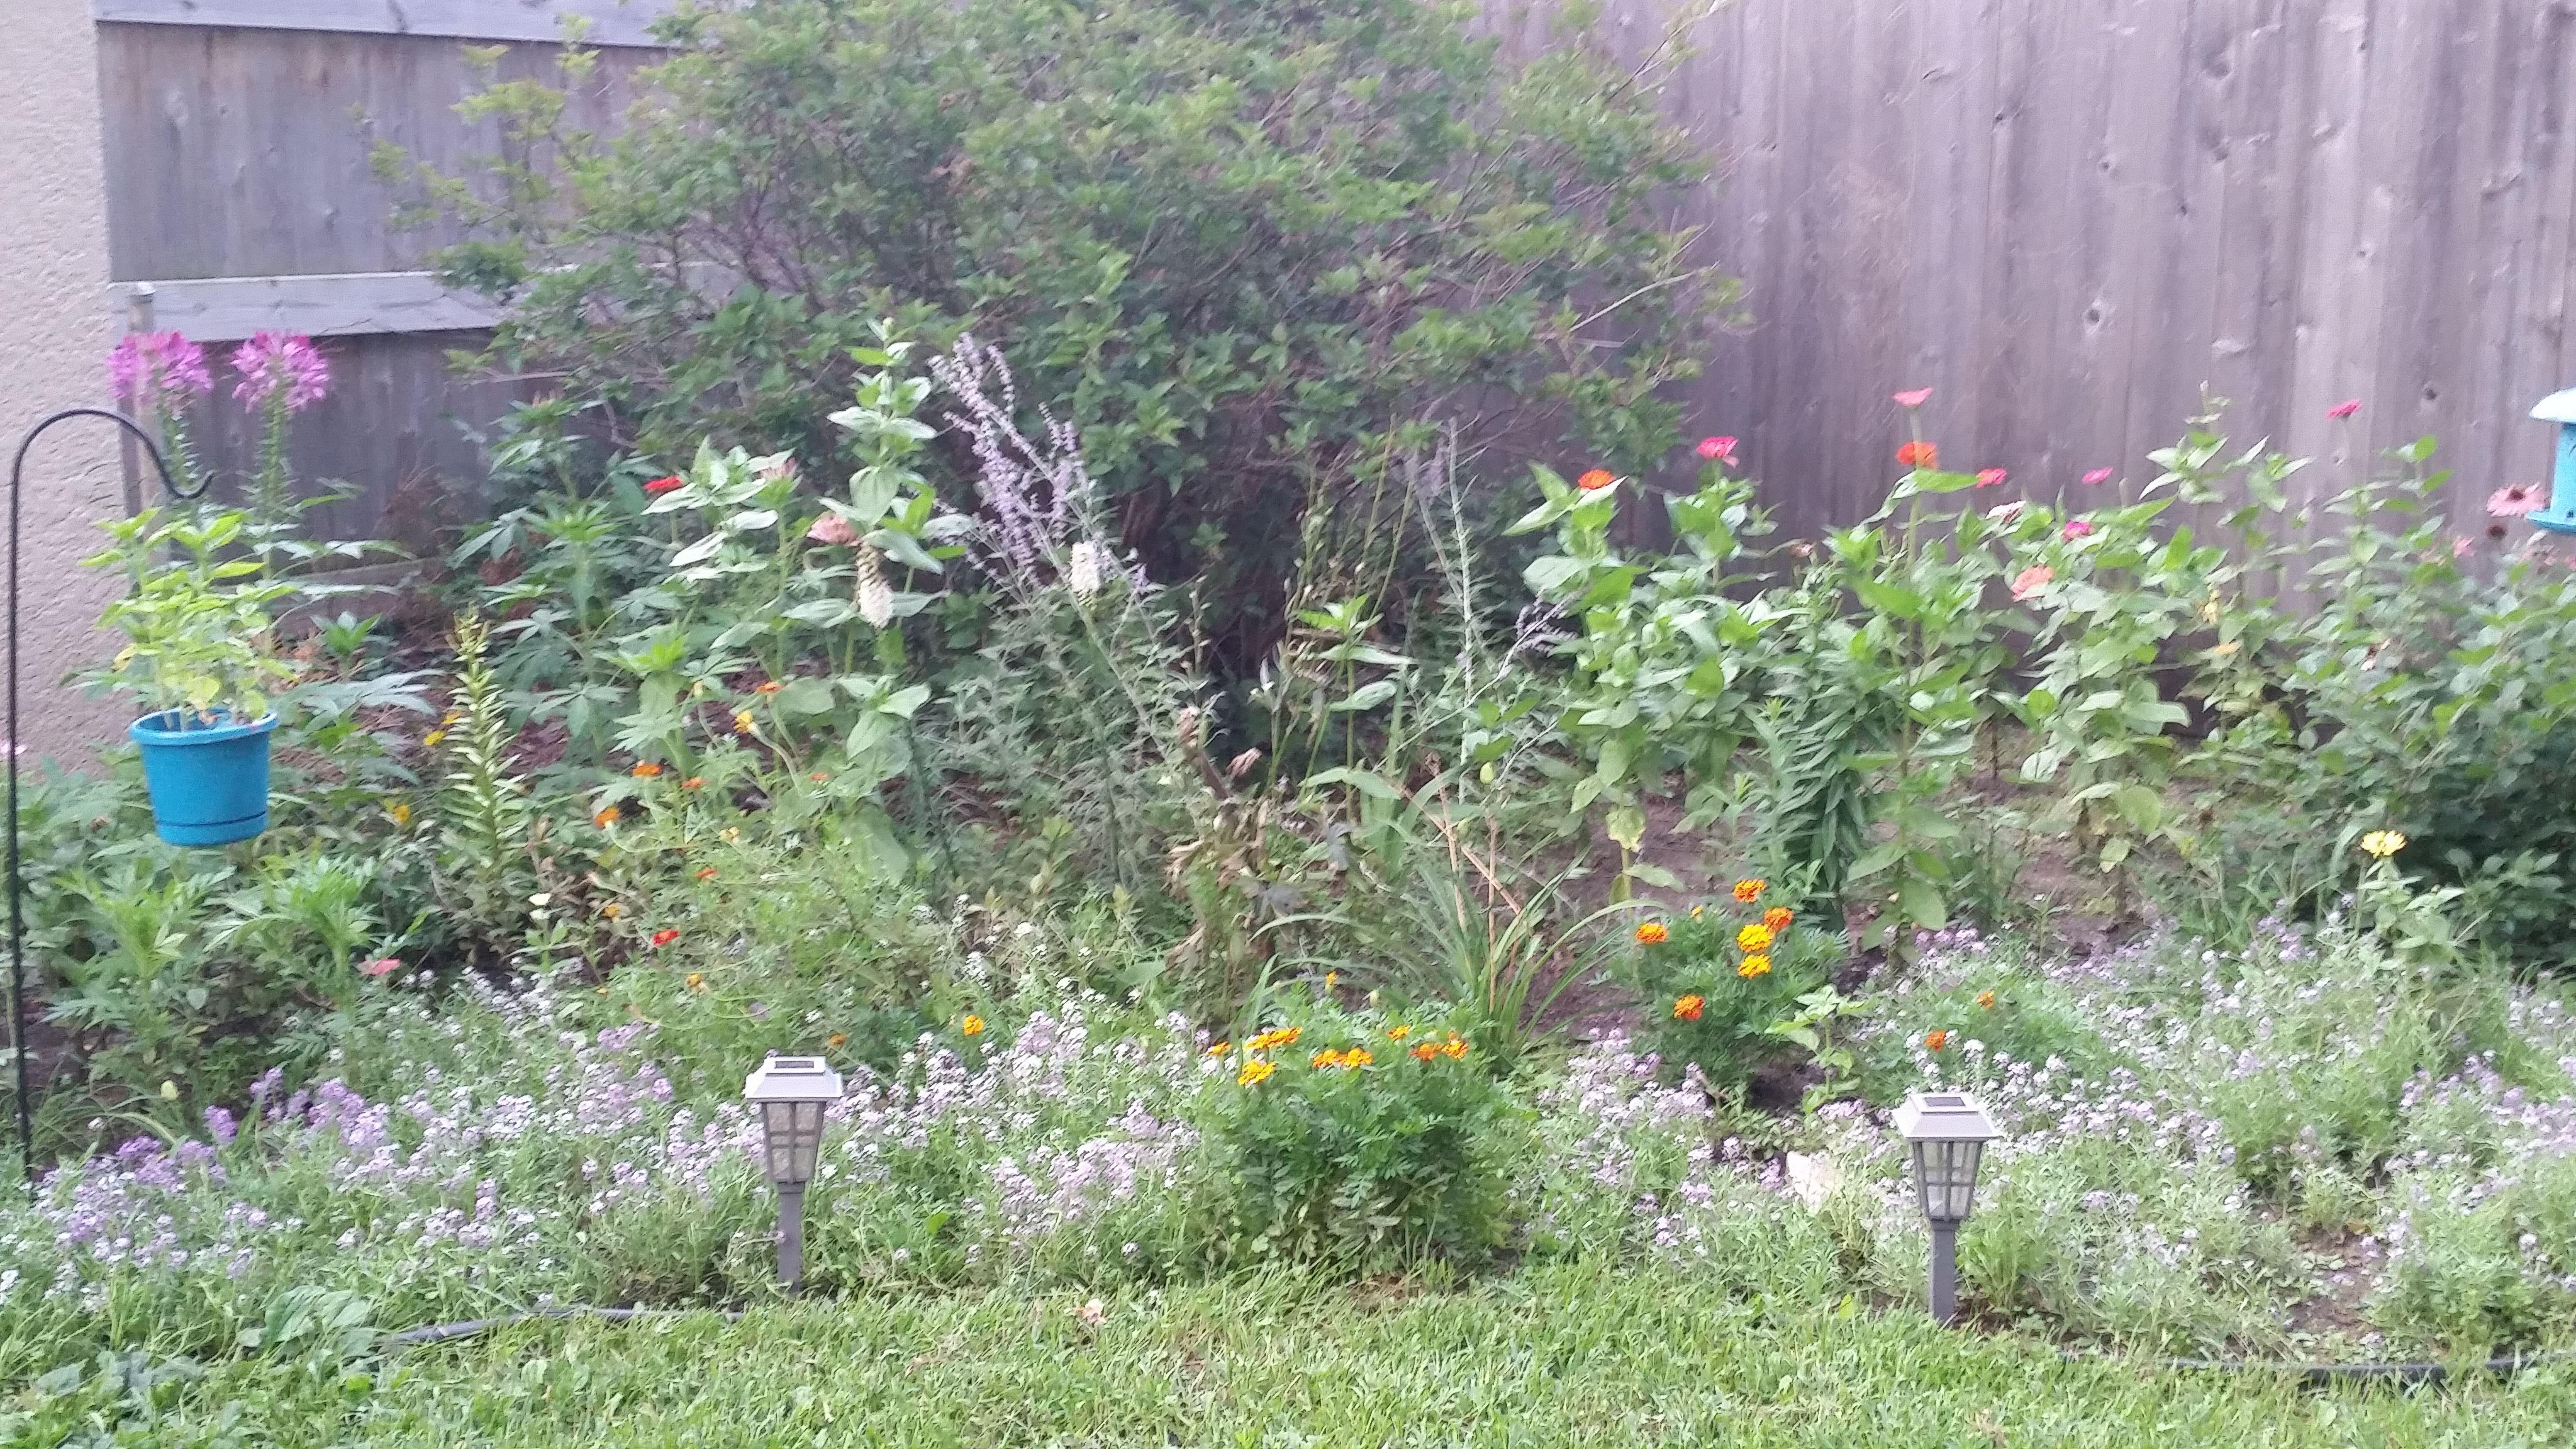 Corner garden: purple coneflower, zinnias, cleome, marigold, lavender and alyssum.